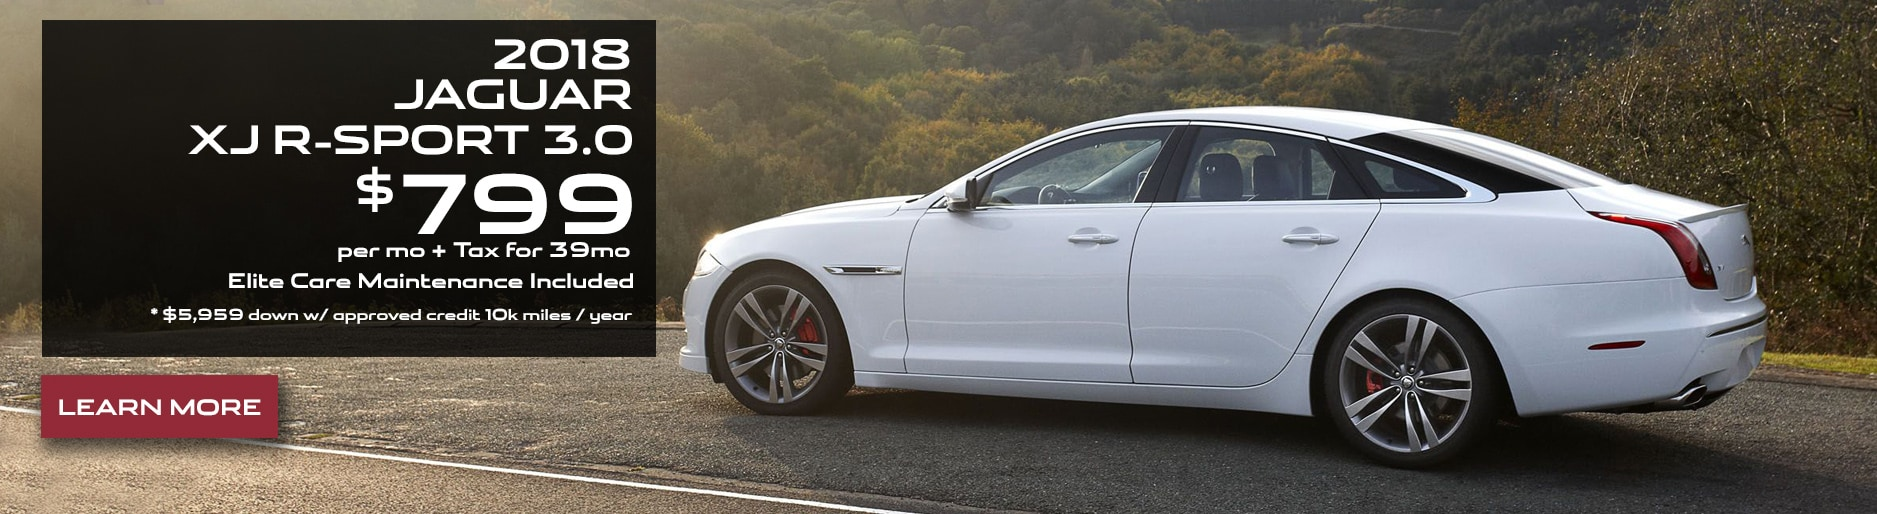 land new near s at sportbrake jaguar dealer rover me video xf dealership awd detail